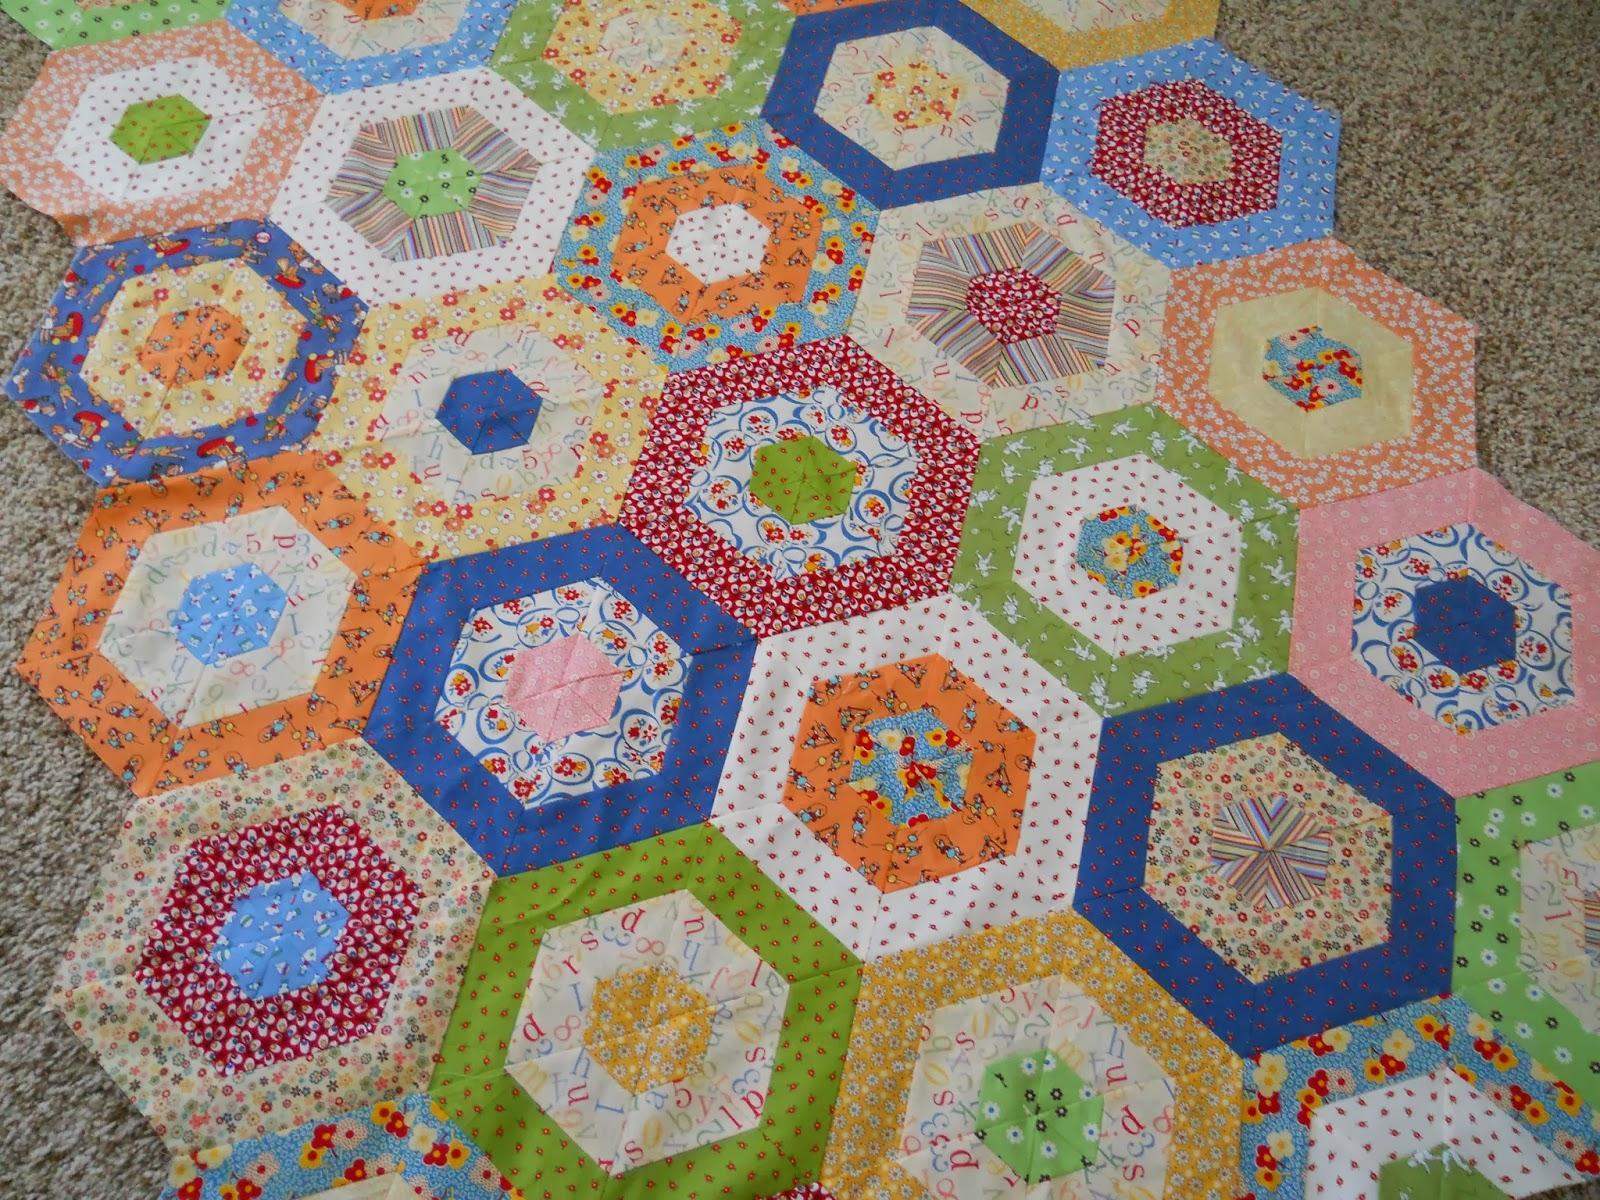 Quilt Patterns With Y Seams : Polka Dot Quilter: Hexagon Tutorial / Pattern with no Y seams/ Vintage fabrics